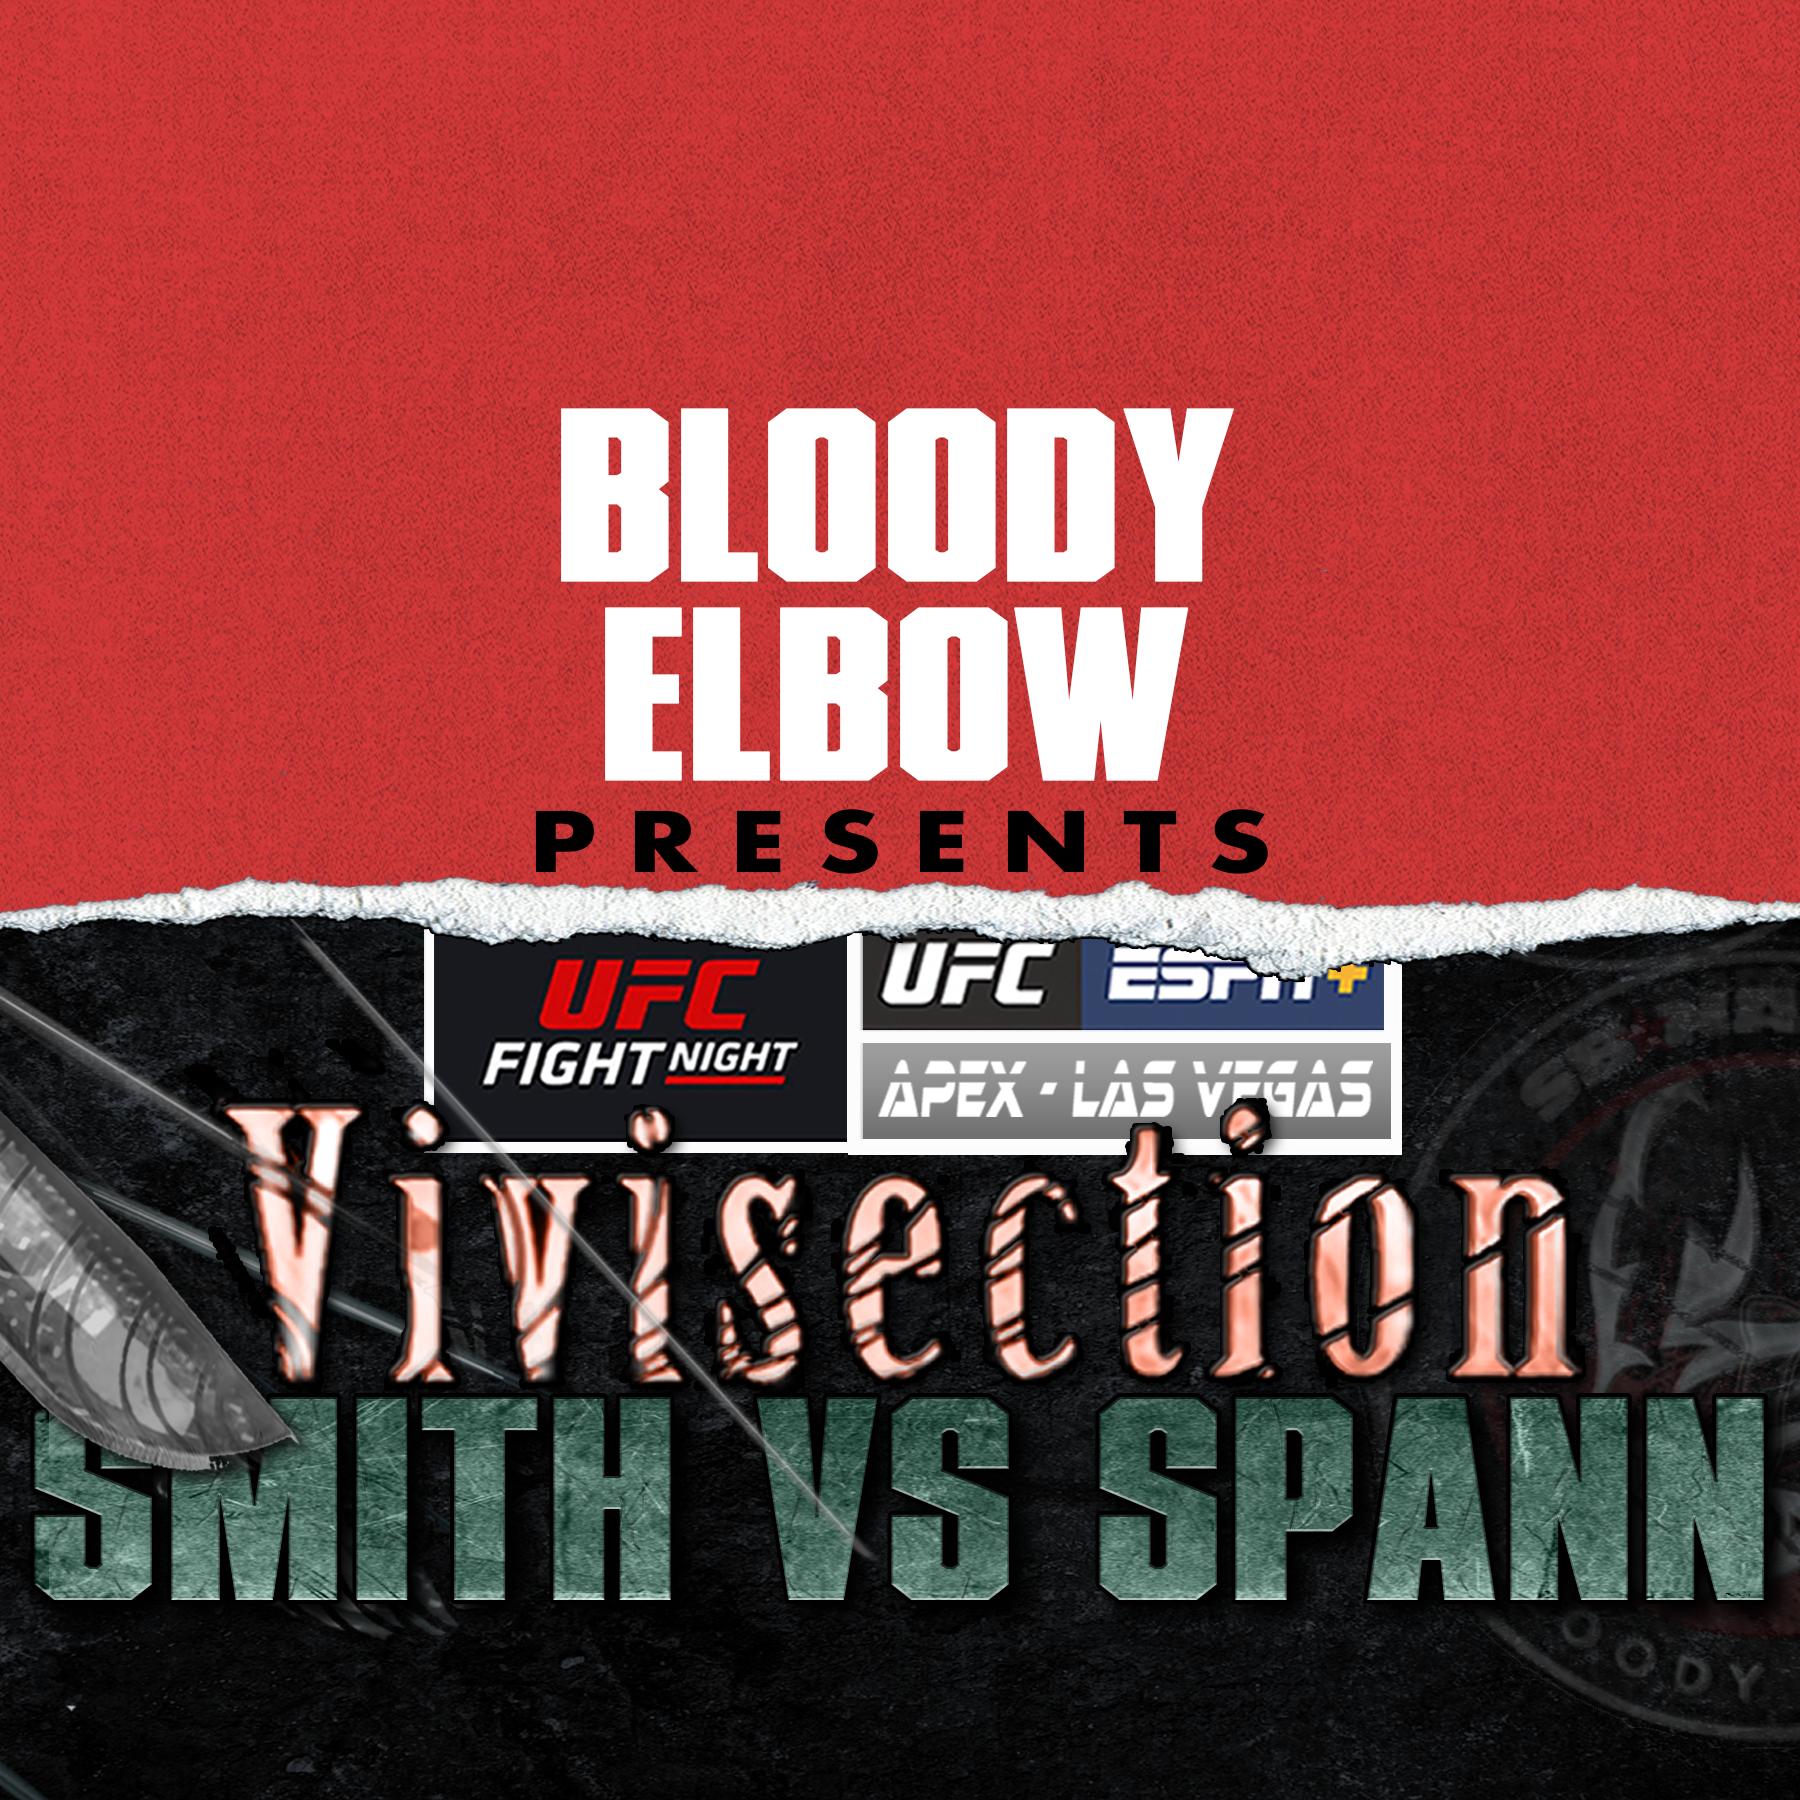 MMA Vivi, The MMA Vivisection, UFC Podcast, MMA Podcast, UFC Vegas 37, Anthony Smith vs Ryan Spann, UFC Picks & Predictions, UFC Analysis, UFC Odds, UFC Preview,